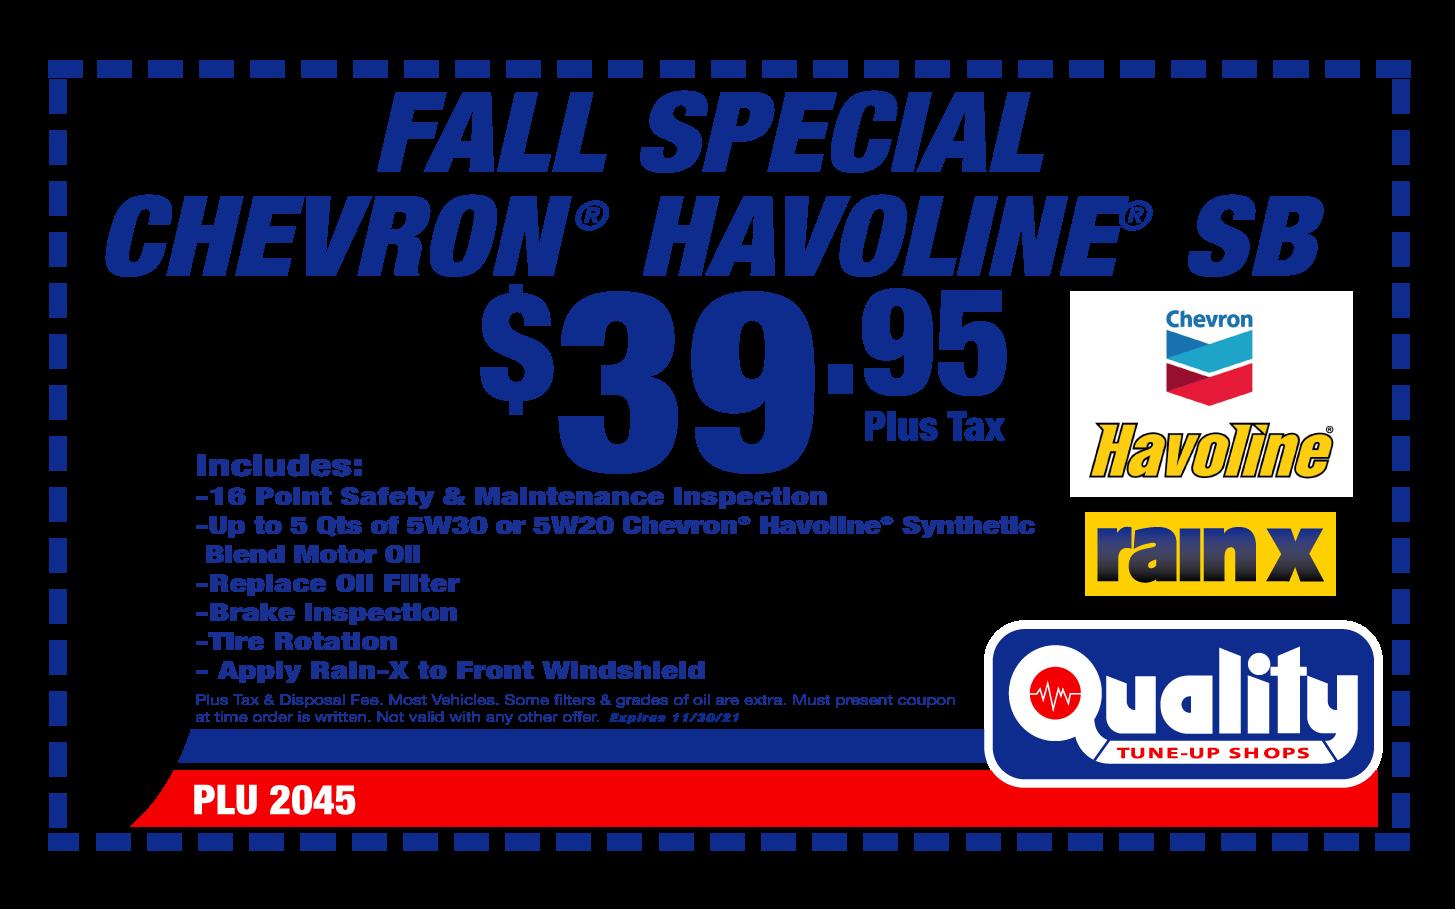 Fall Special Chevron Havoline SB